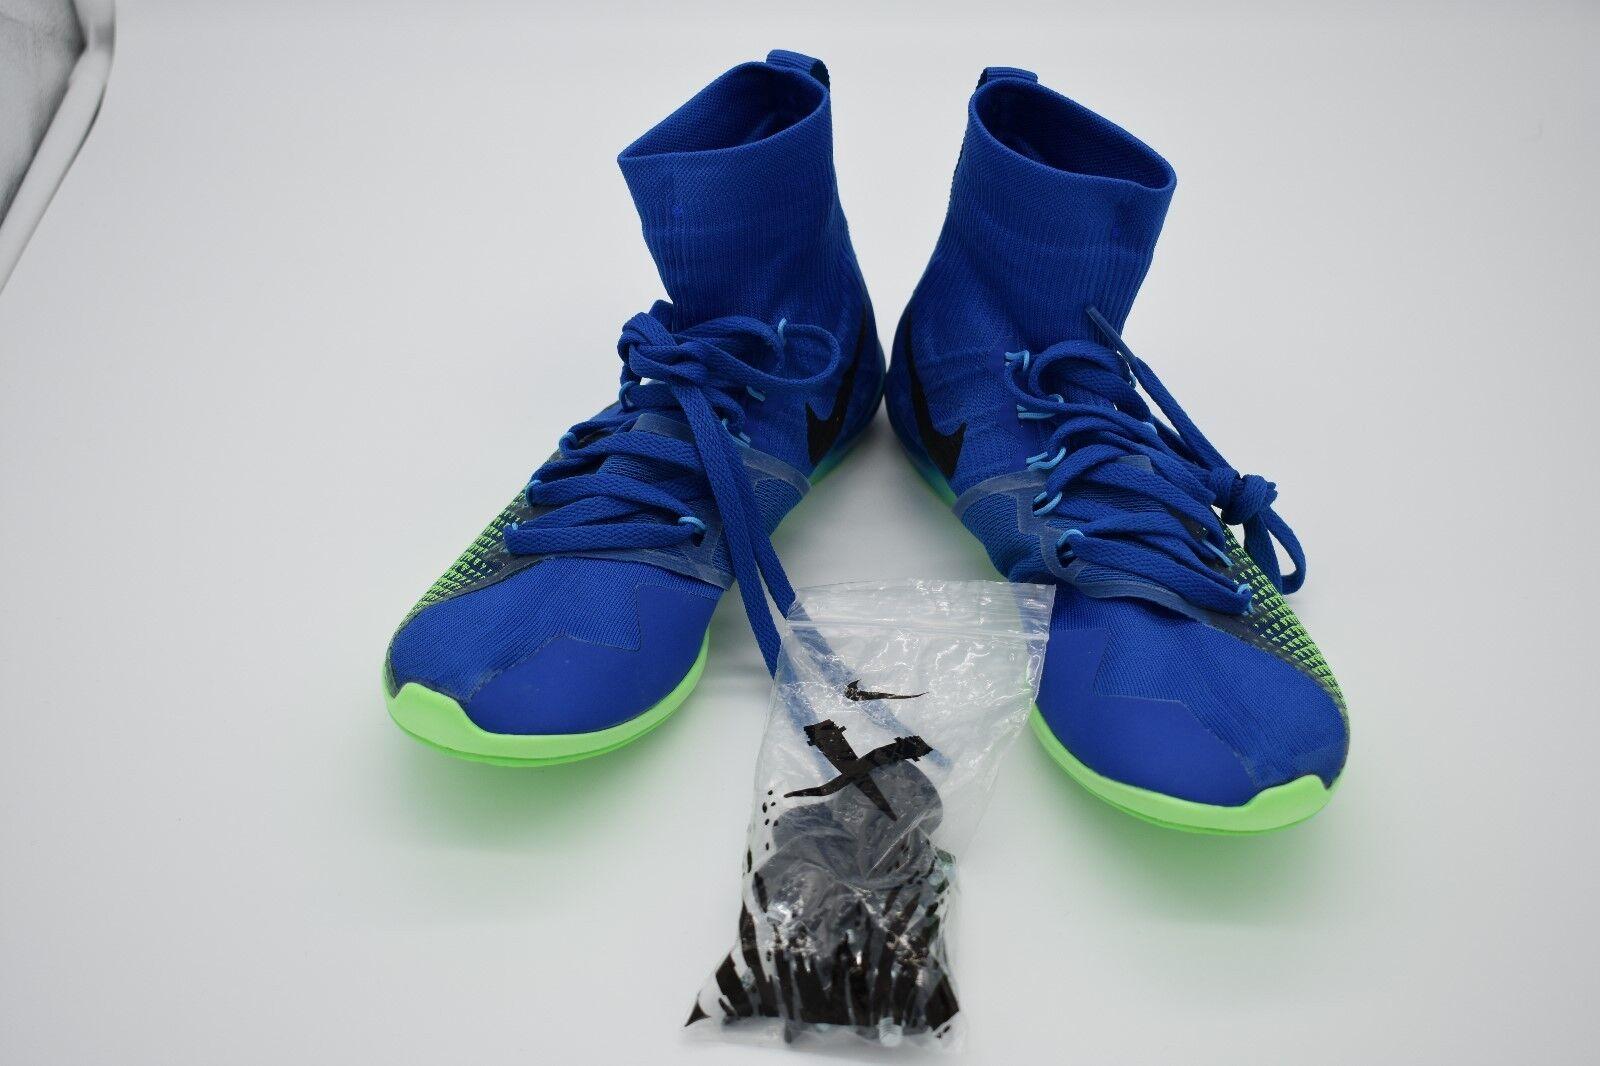 Nike Zoom Azul Victory 4 picos 878804-403 Azul Zoom Verde unisex XC pista hombres cómodos e6e7f1